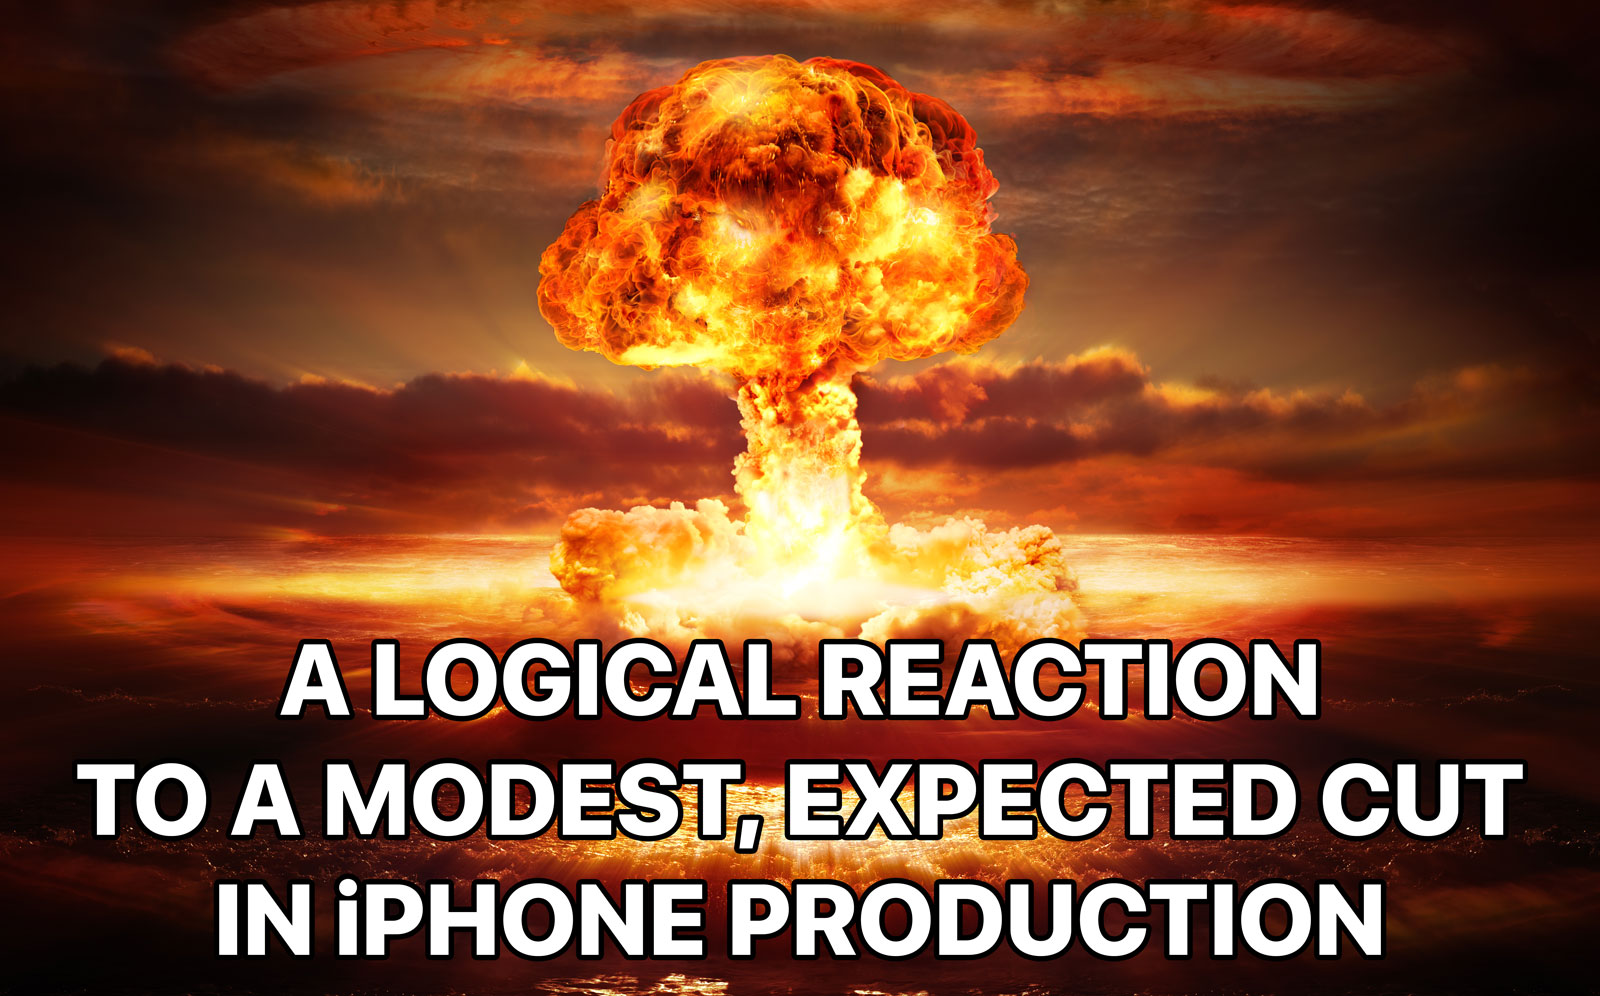 iphone production cut reaction